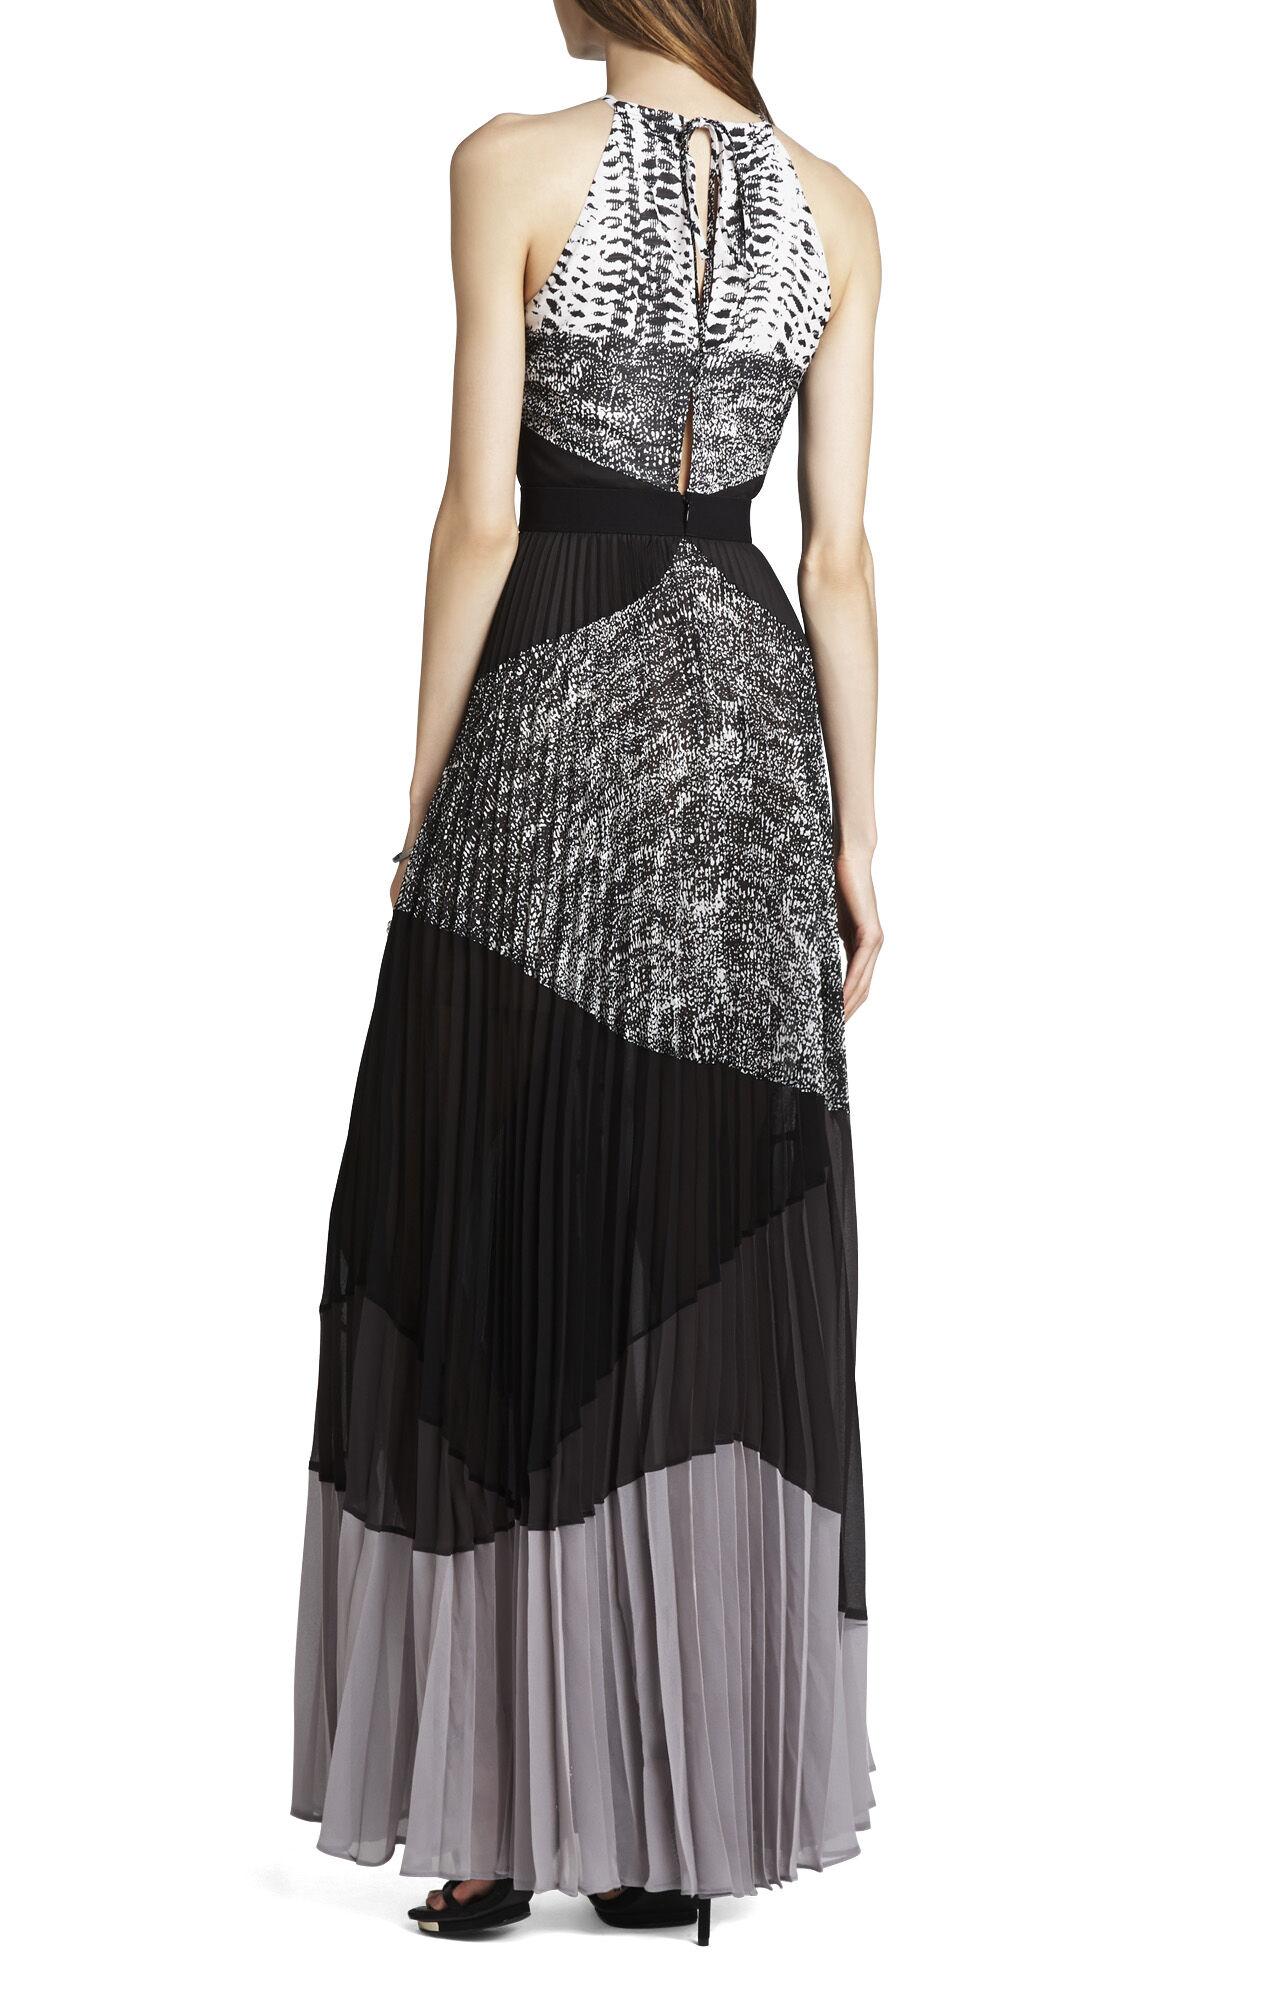 Clarissa Pleated Halter Dress